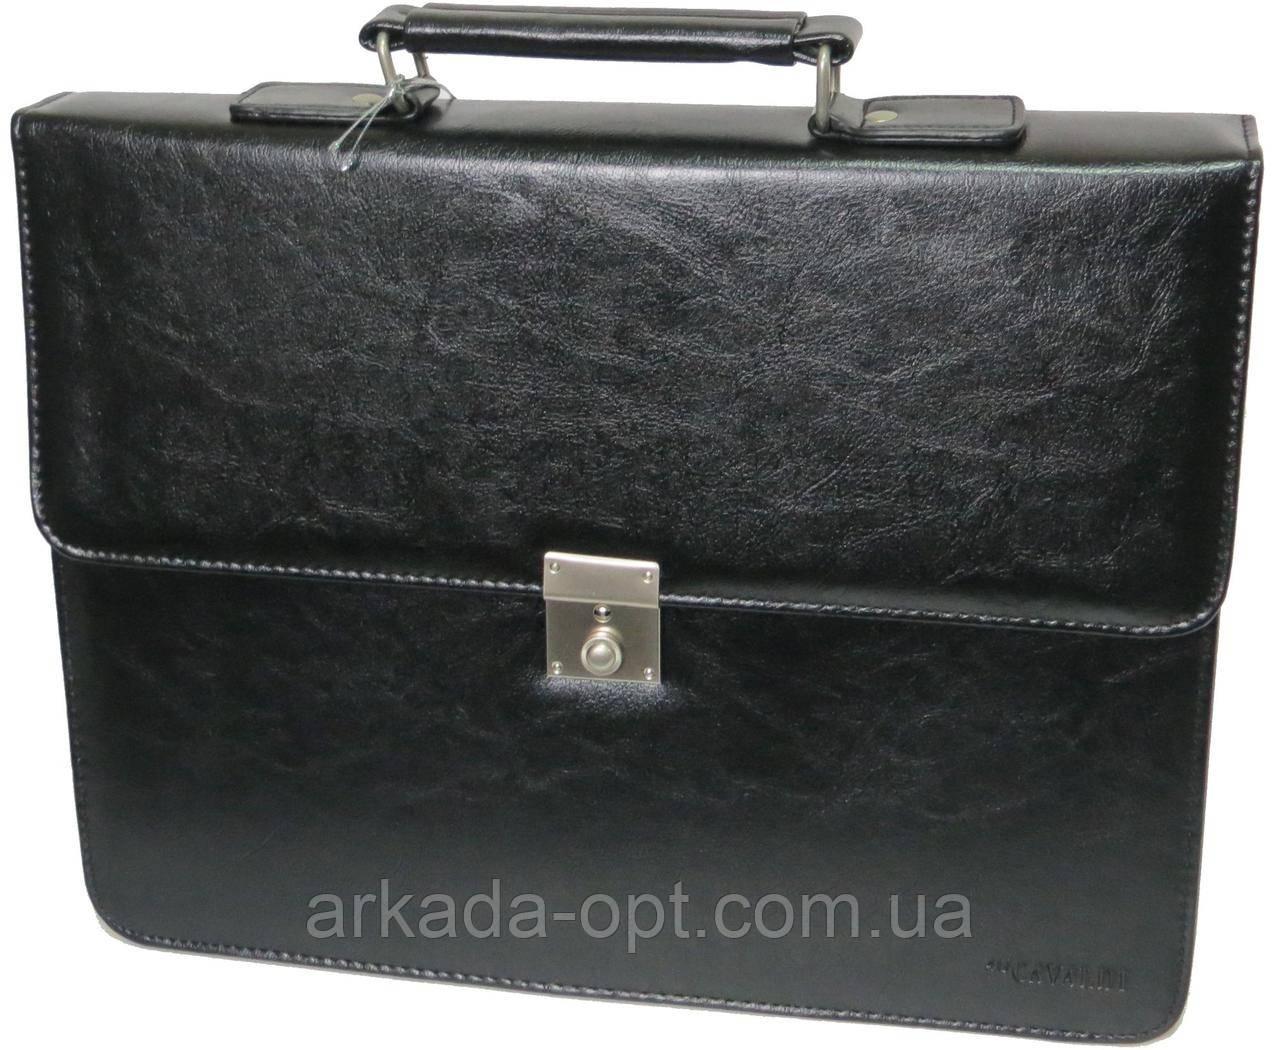 Портфель 4U Cavaldi Чорний (B020139 black)